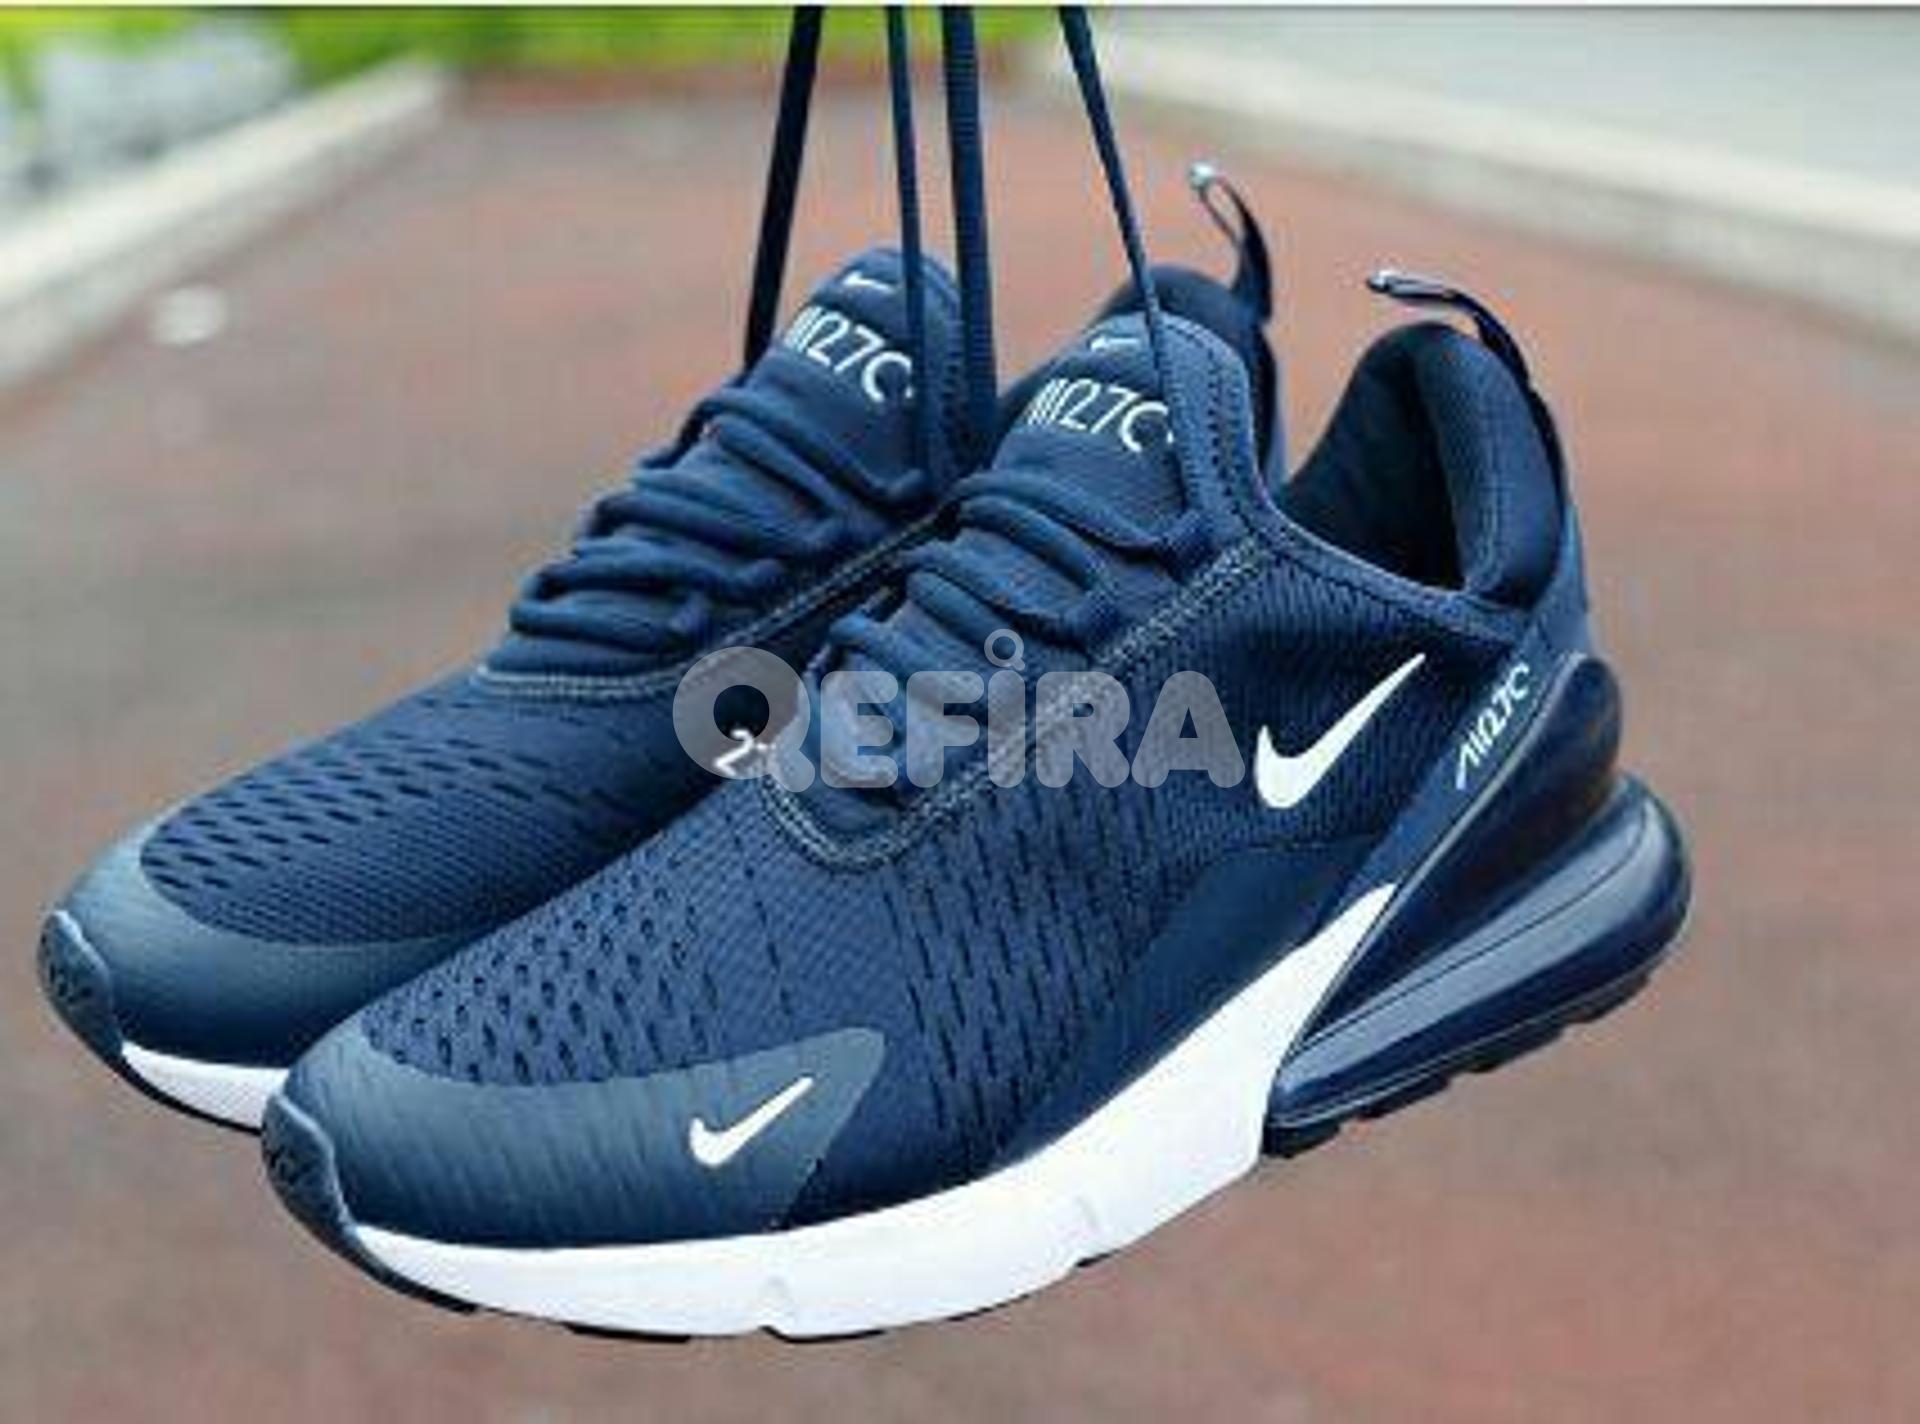 Nike Air 27c Women's Shoe in Addis